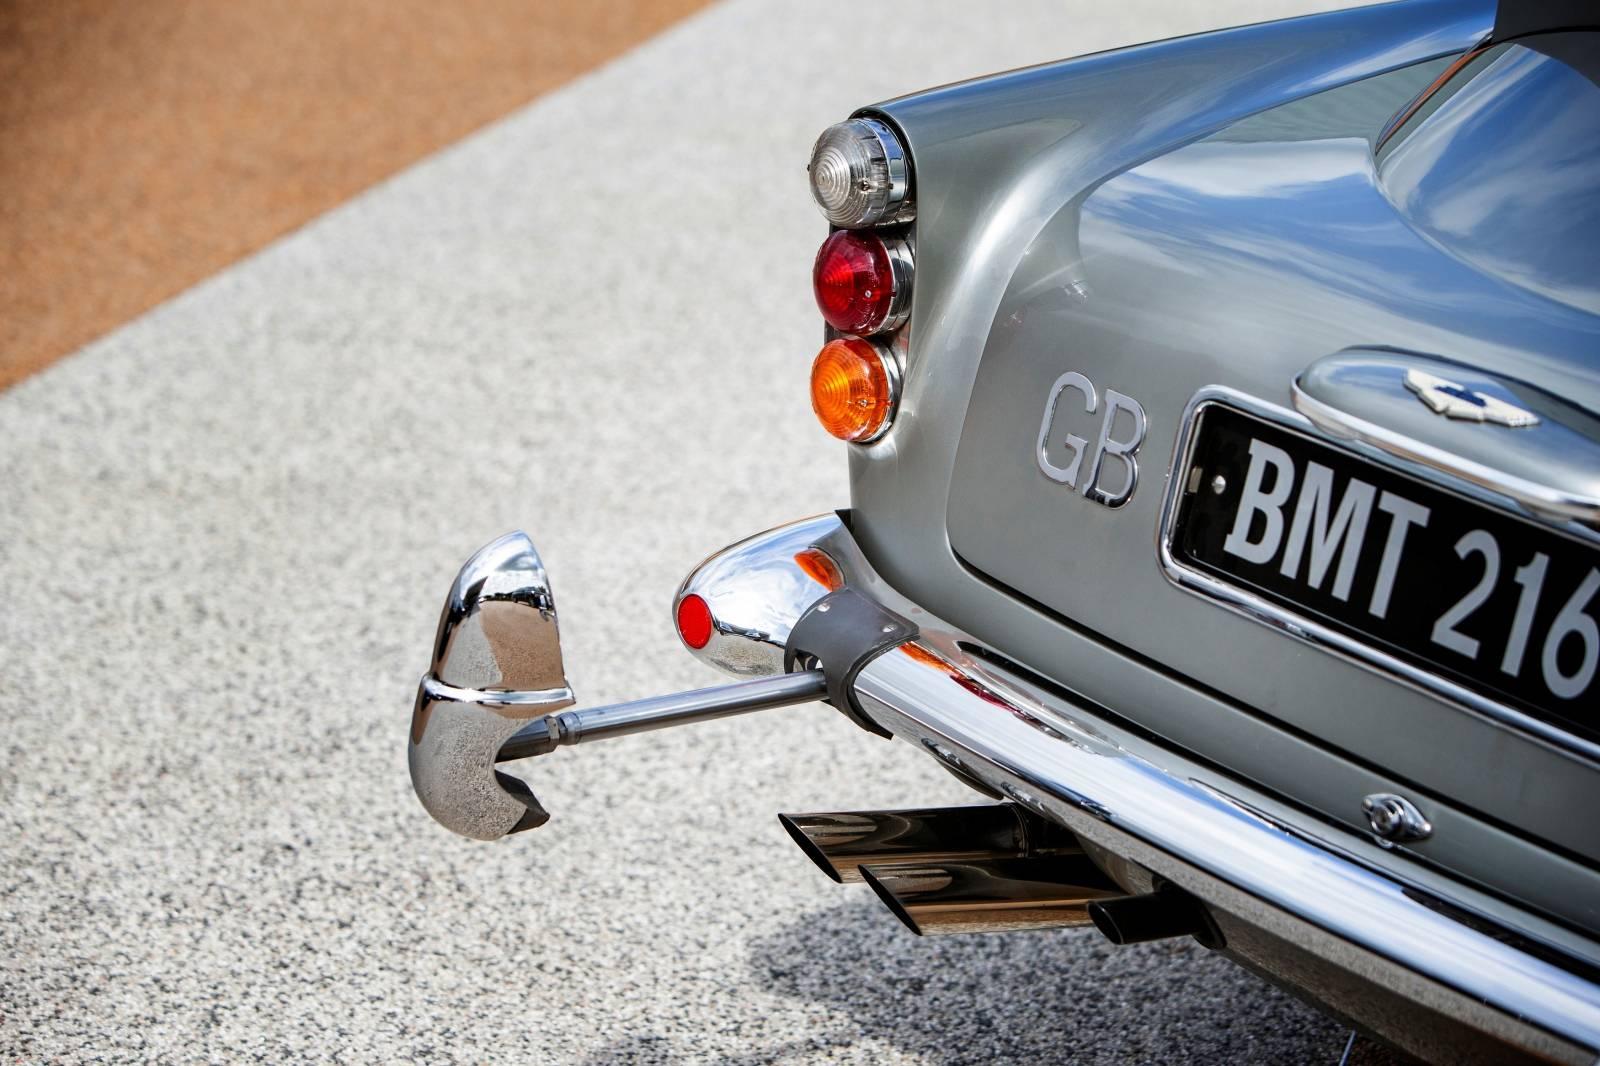 Handout photo of the detail of rear fender of an original Aston Martin DB5 James Bond car